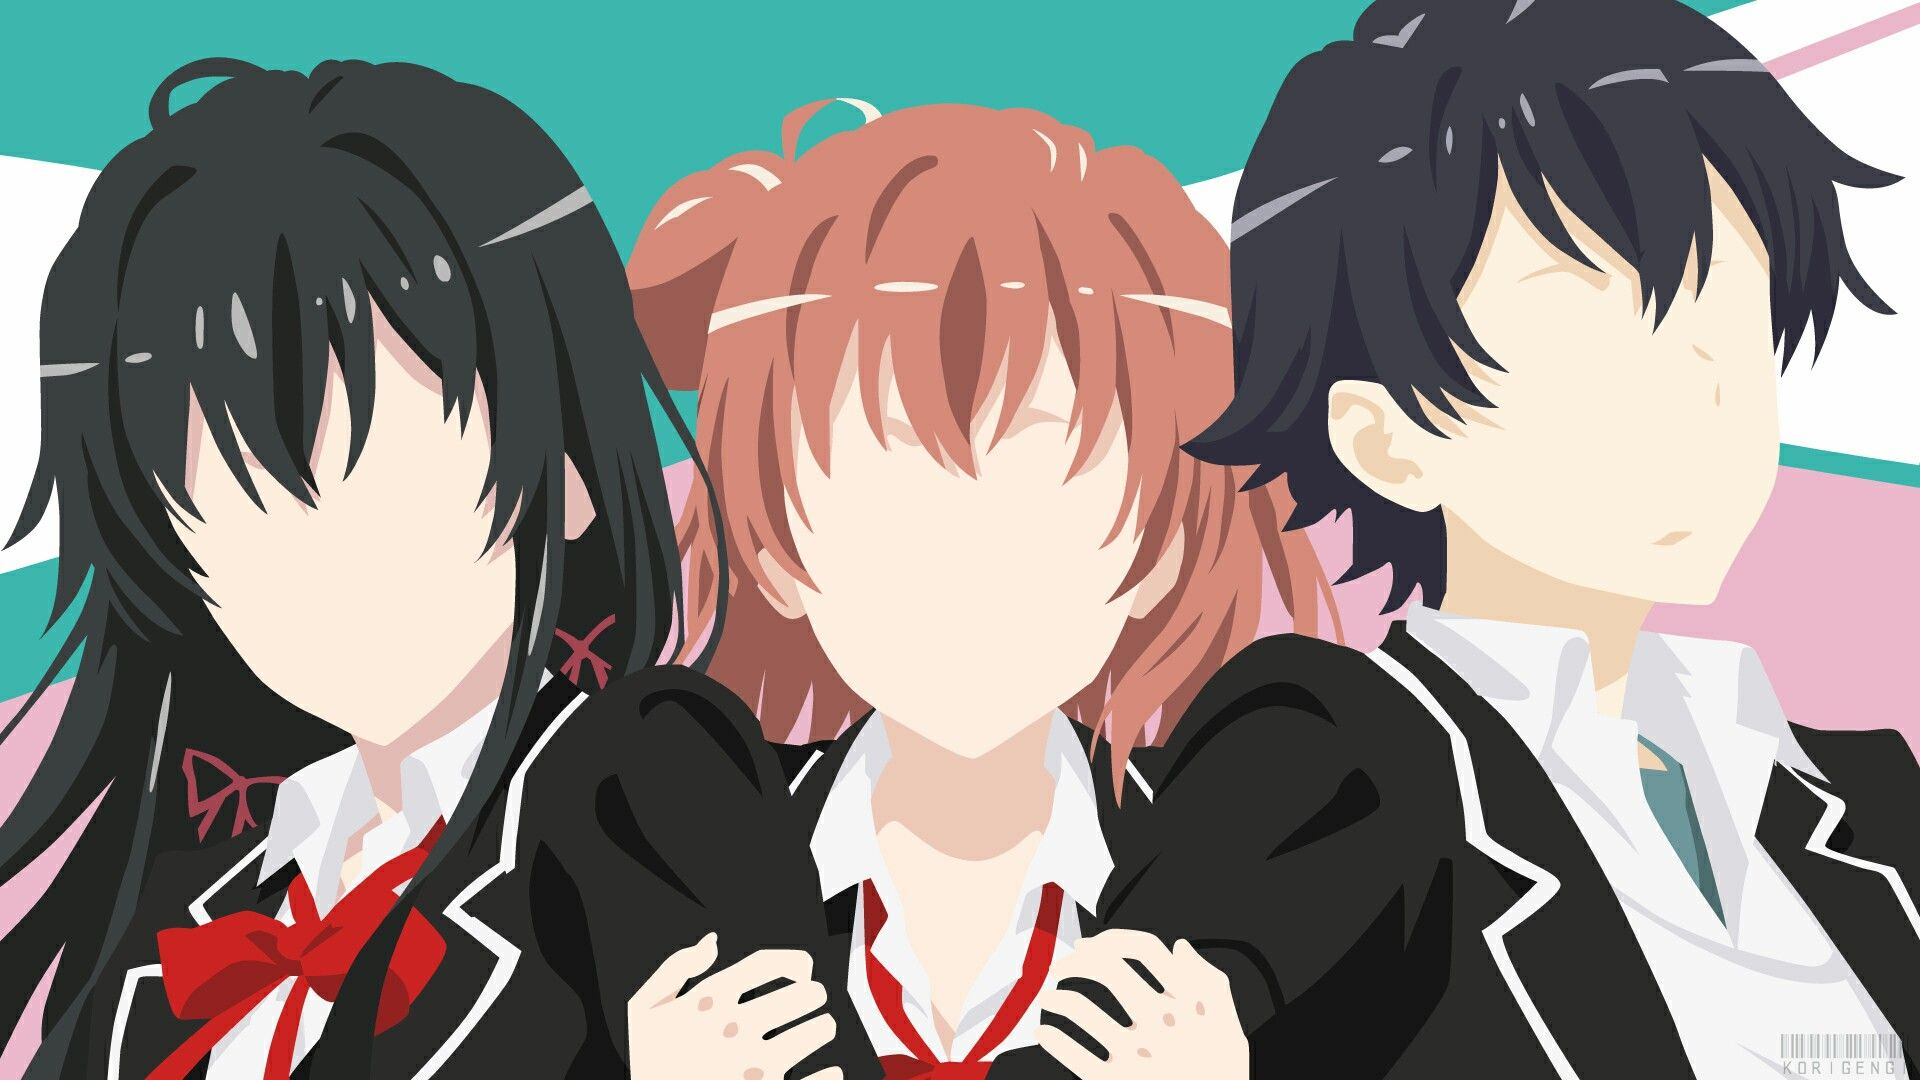 Pin by WACKY ARTISTRY on Oregairu Anime, Minimalist